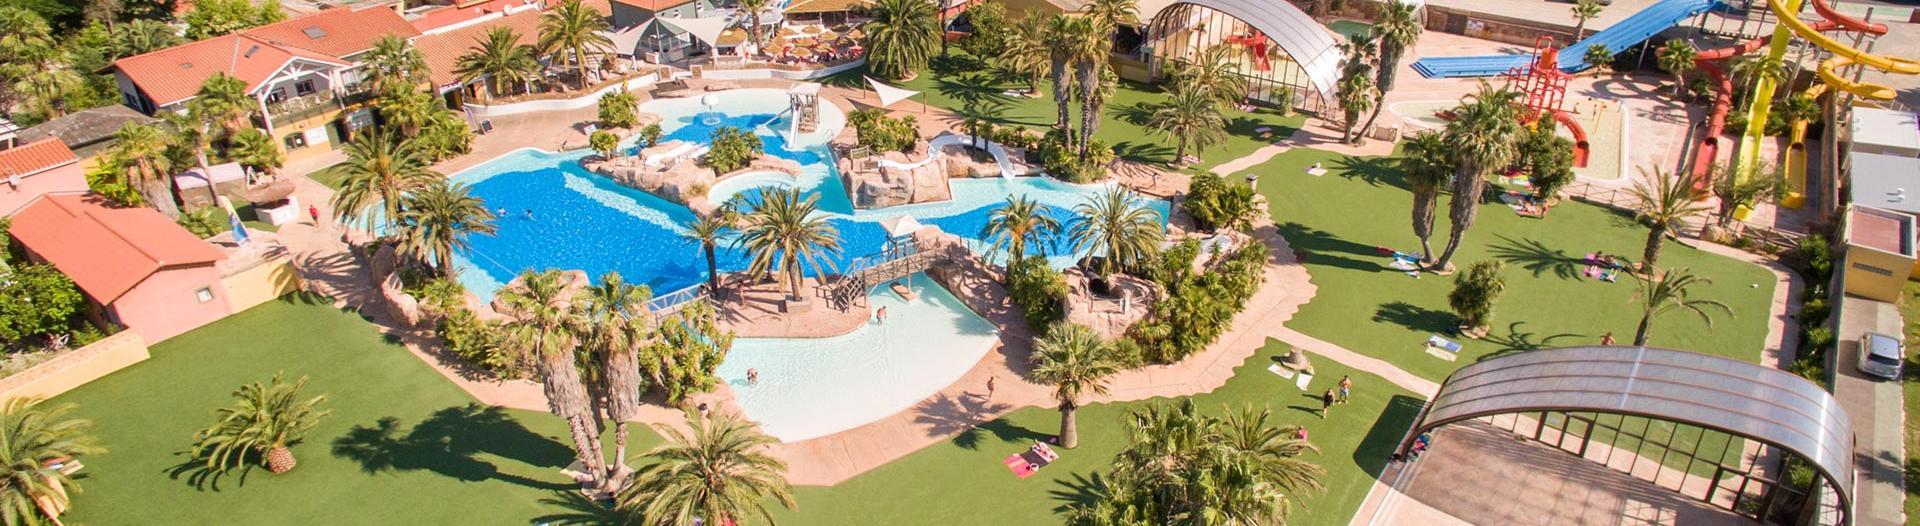 slider-camping-sirene-parc-aquatique-avec-toboggans-2019